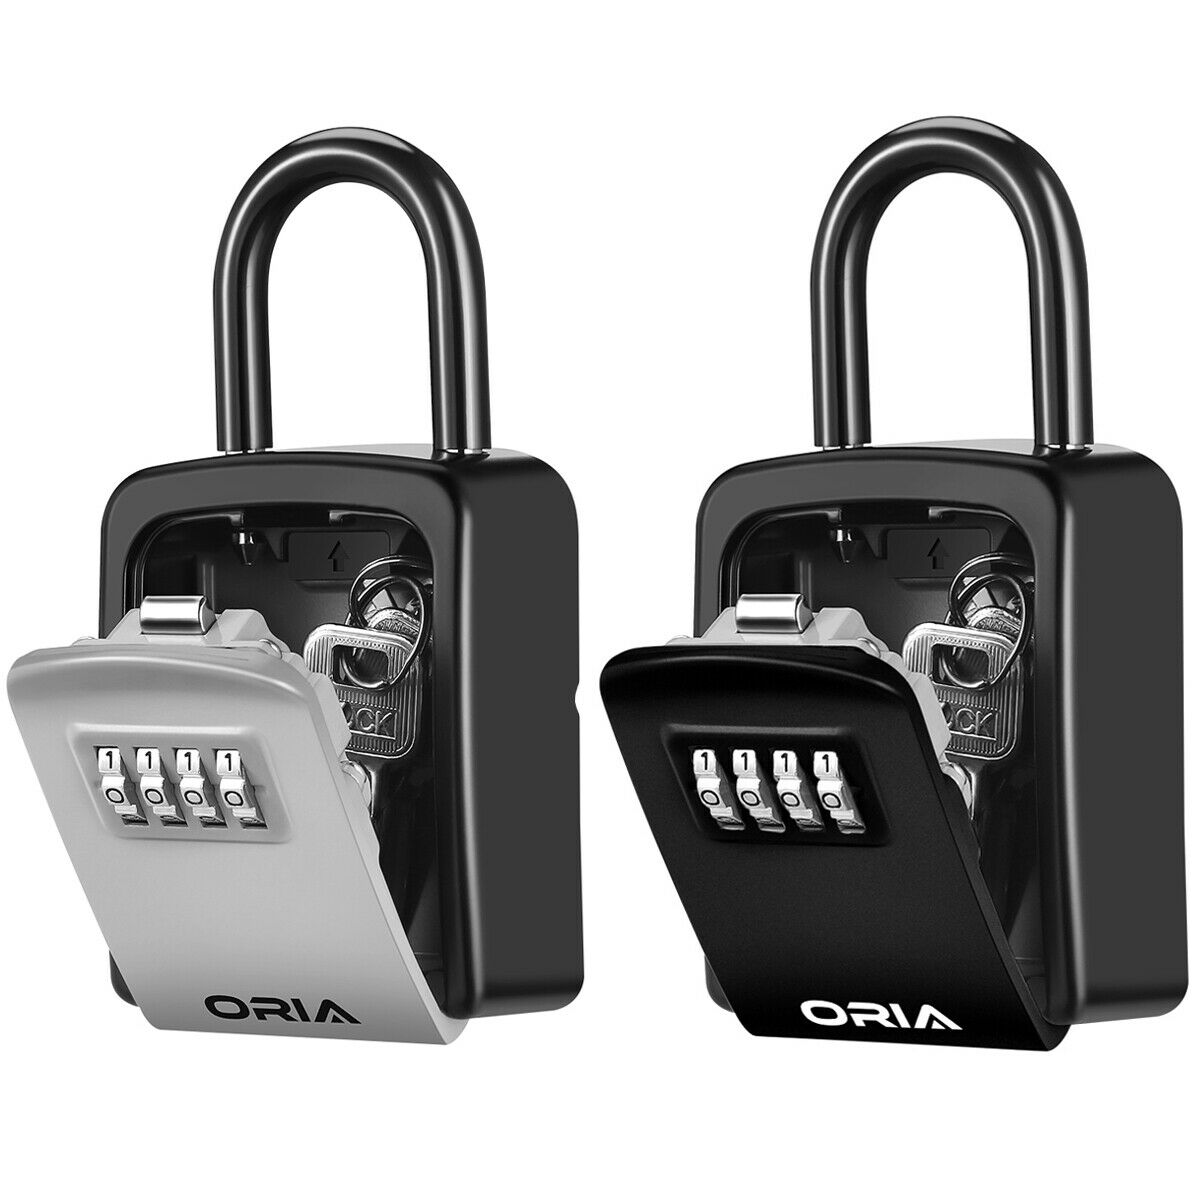 Outdoor Padlock 4/&Digit Combination Password Key Lock Storage Safe Security Box